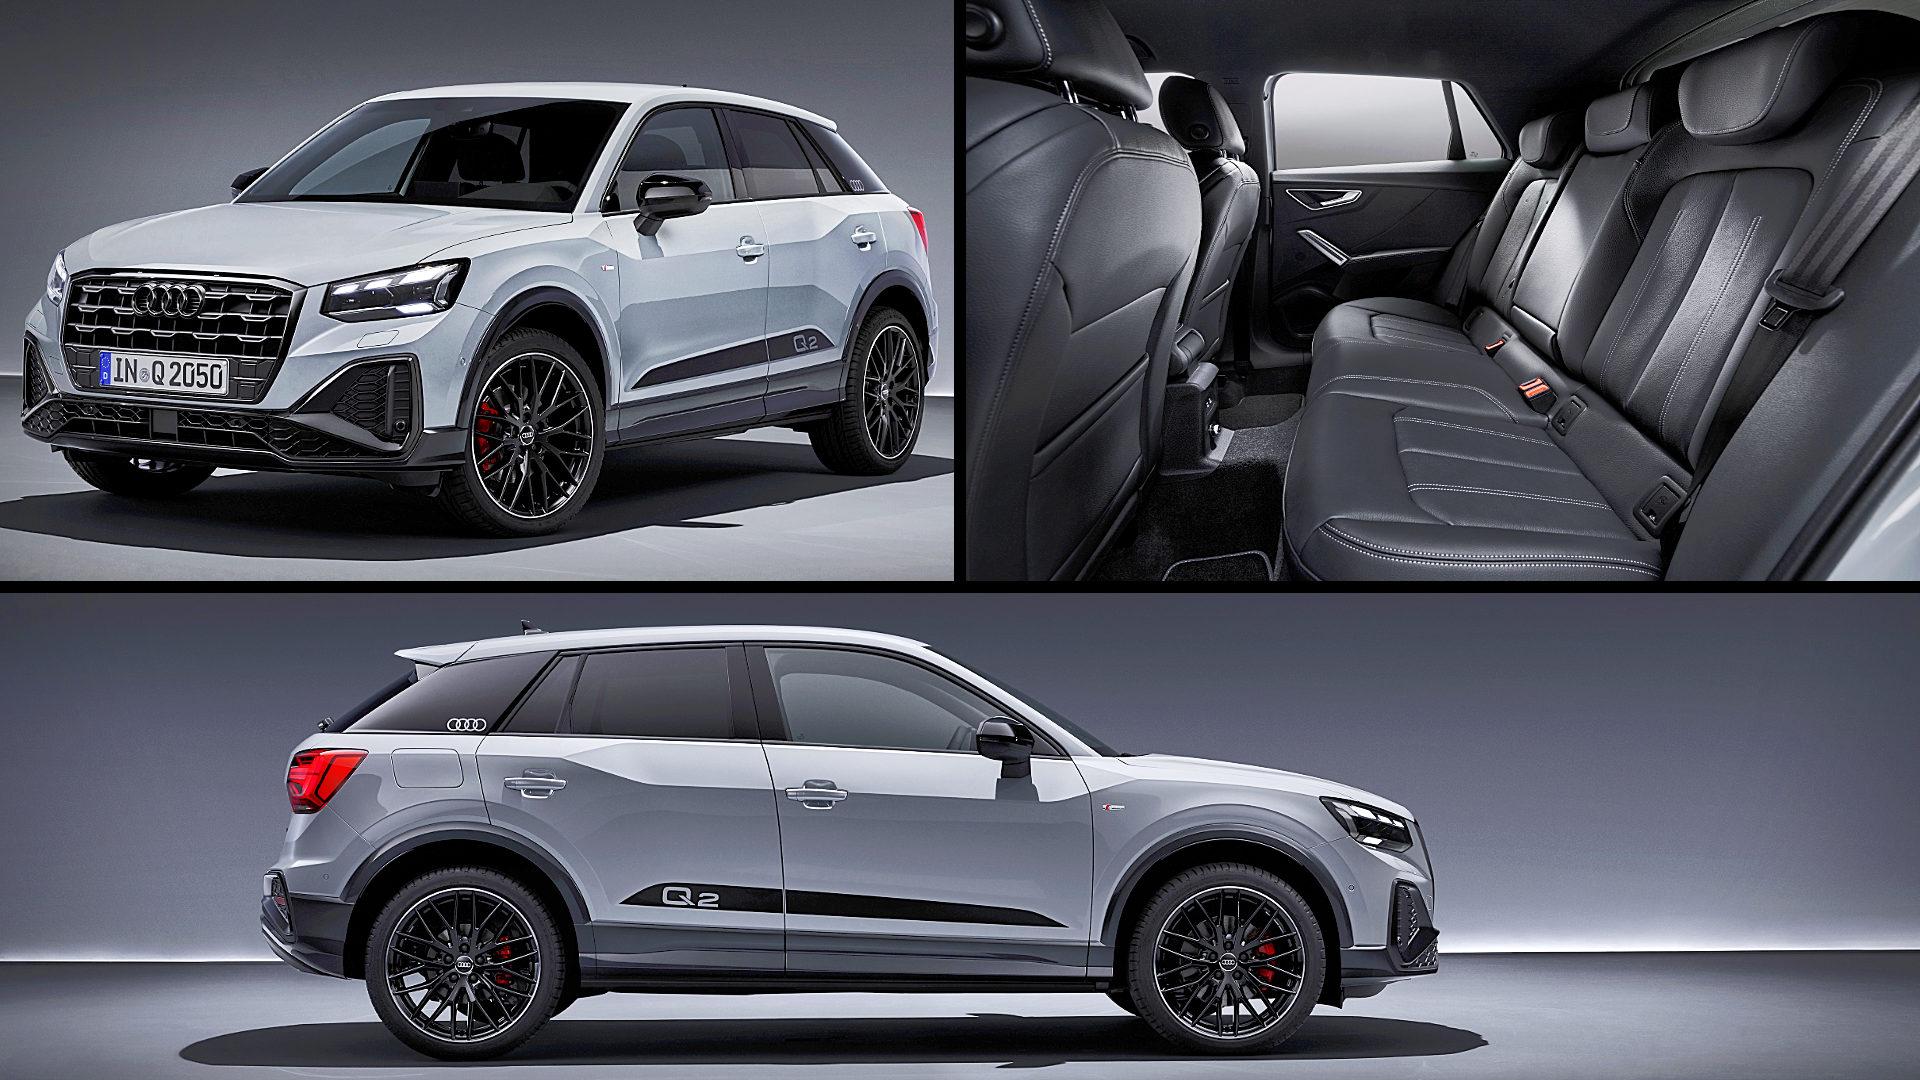 2021 Audi Q2 S Line USA